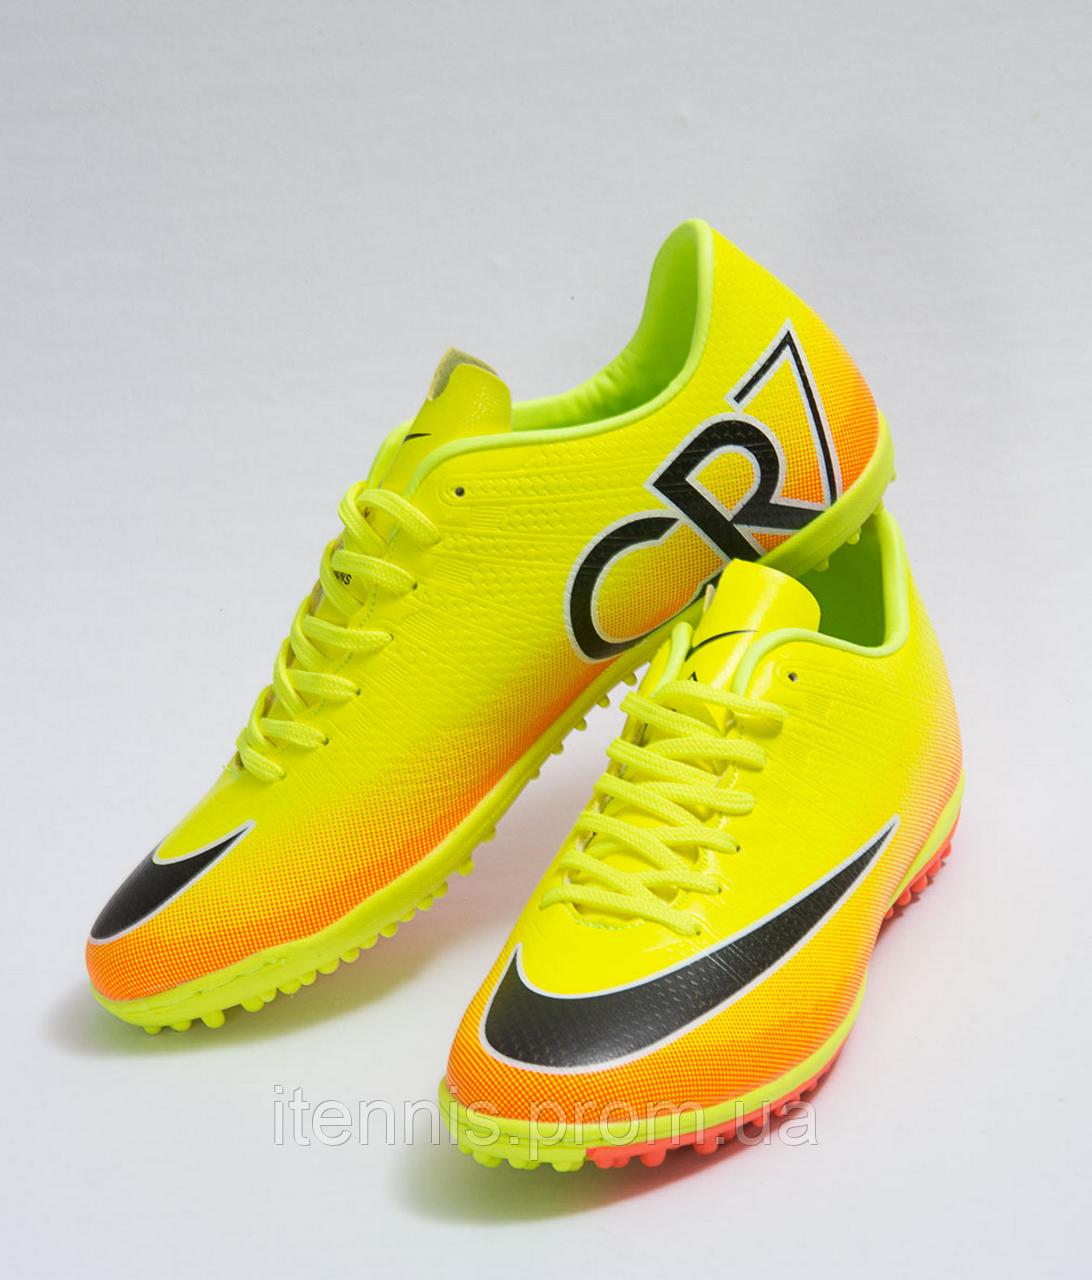 f446bcf9 Футбольные сороконожки Nike CR7 (p.40-45) Volt/Black/Citrus 40, цена ...